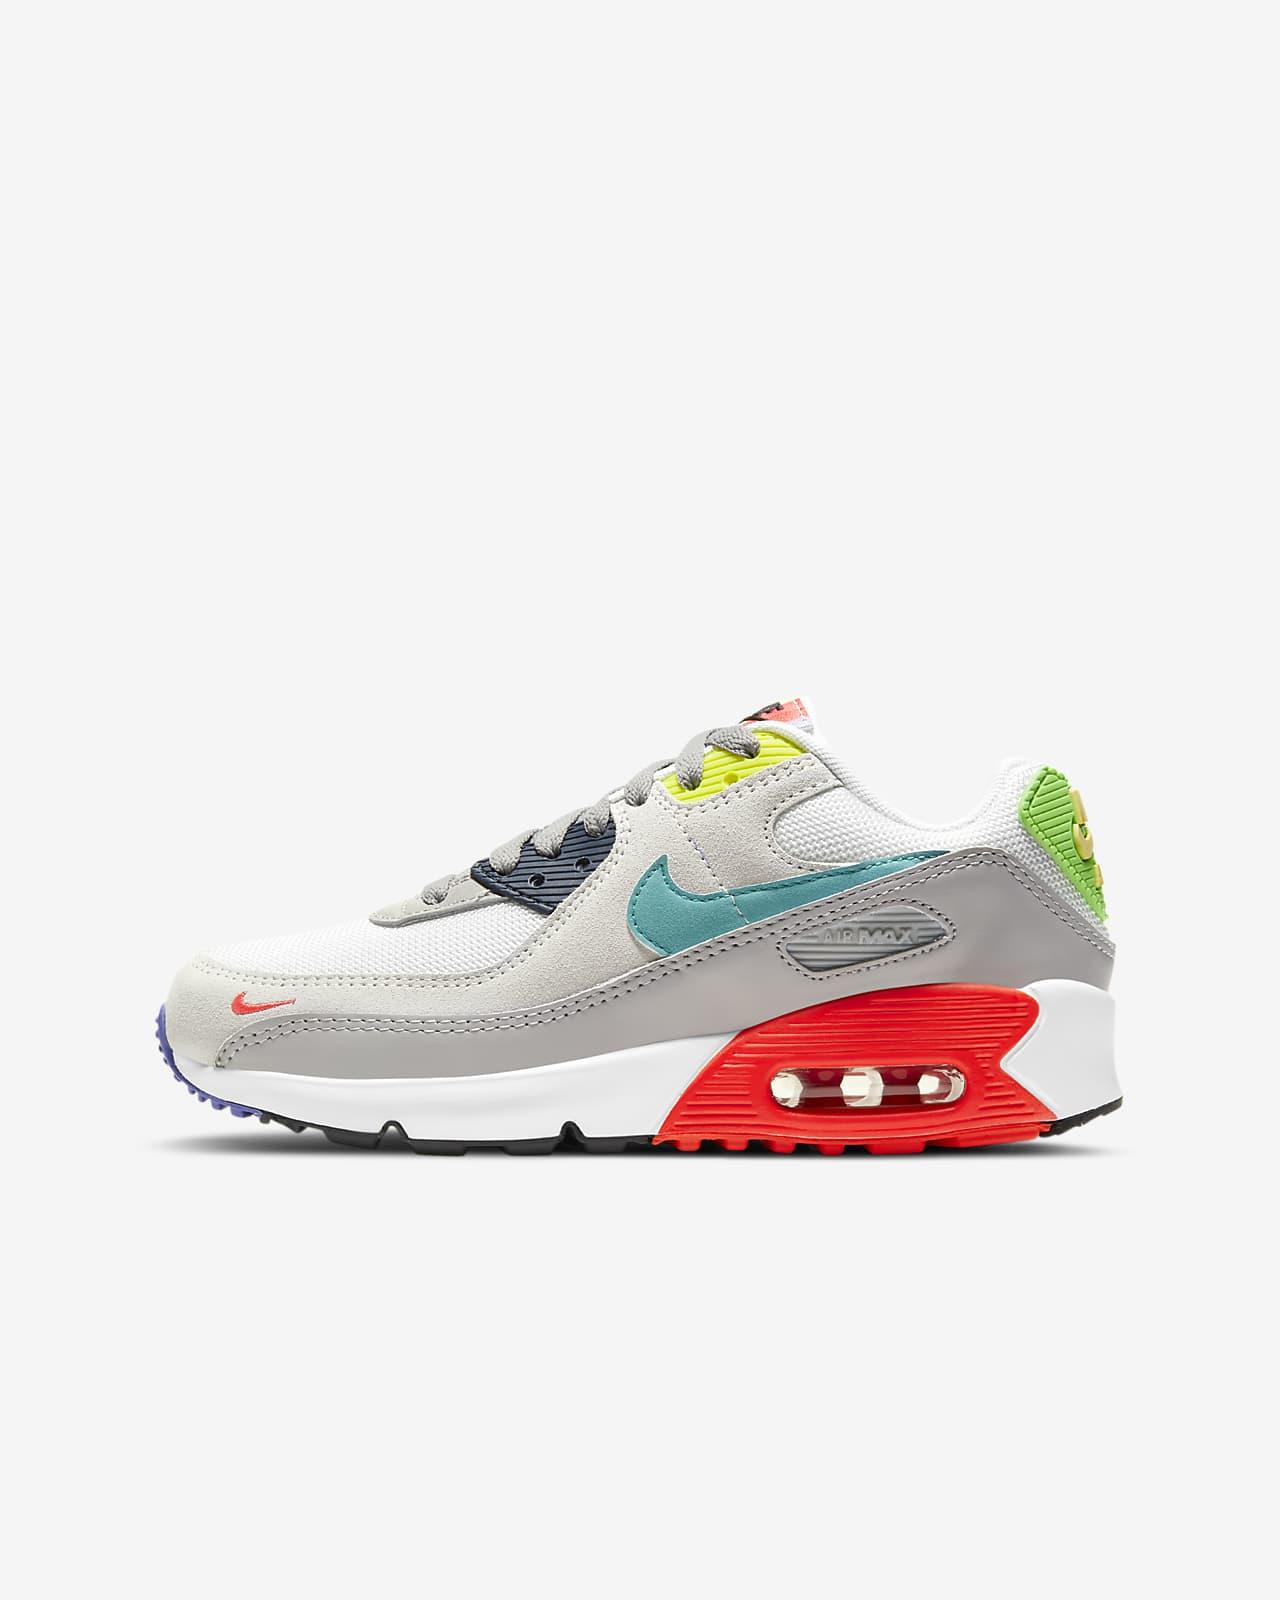 Nike Air Max 90 EOI Big Kids' Shoes